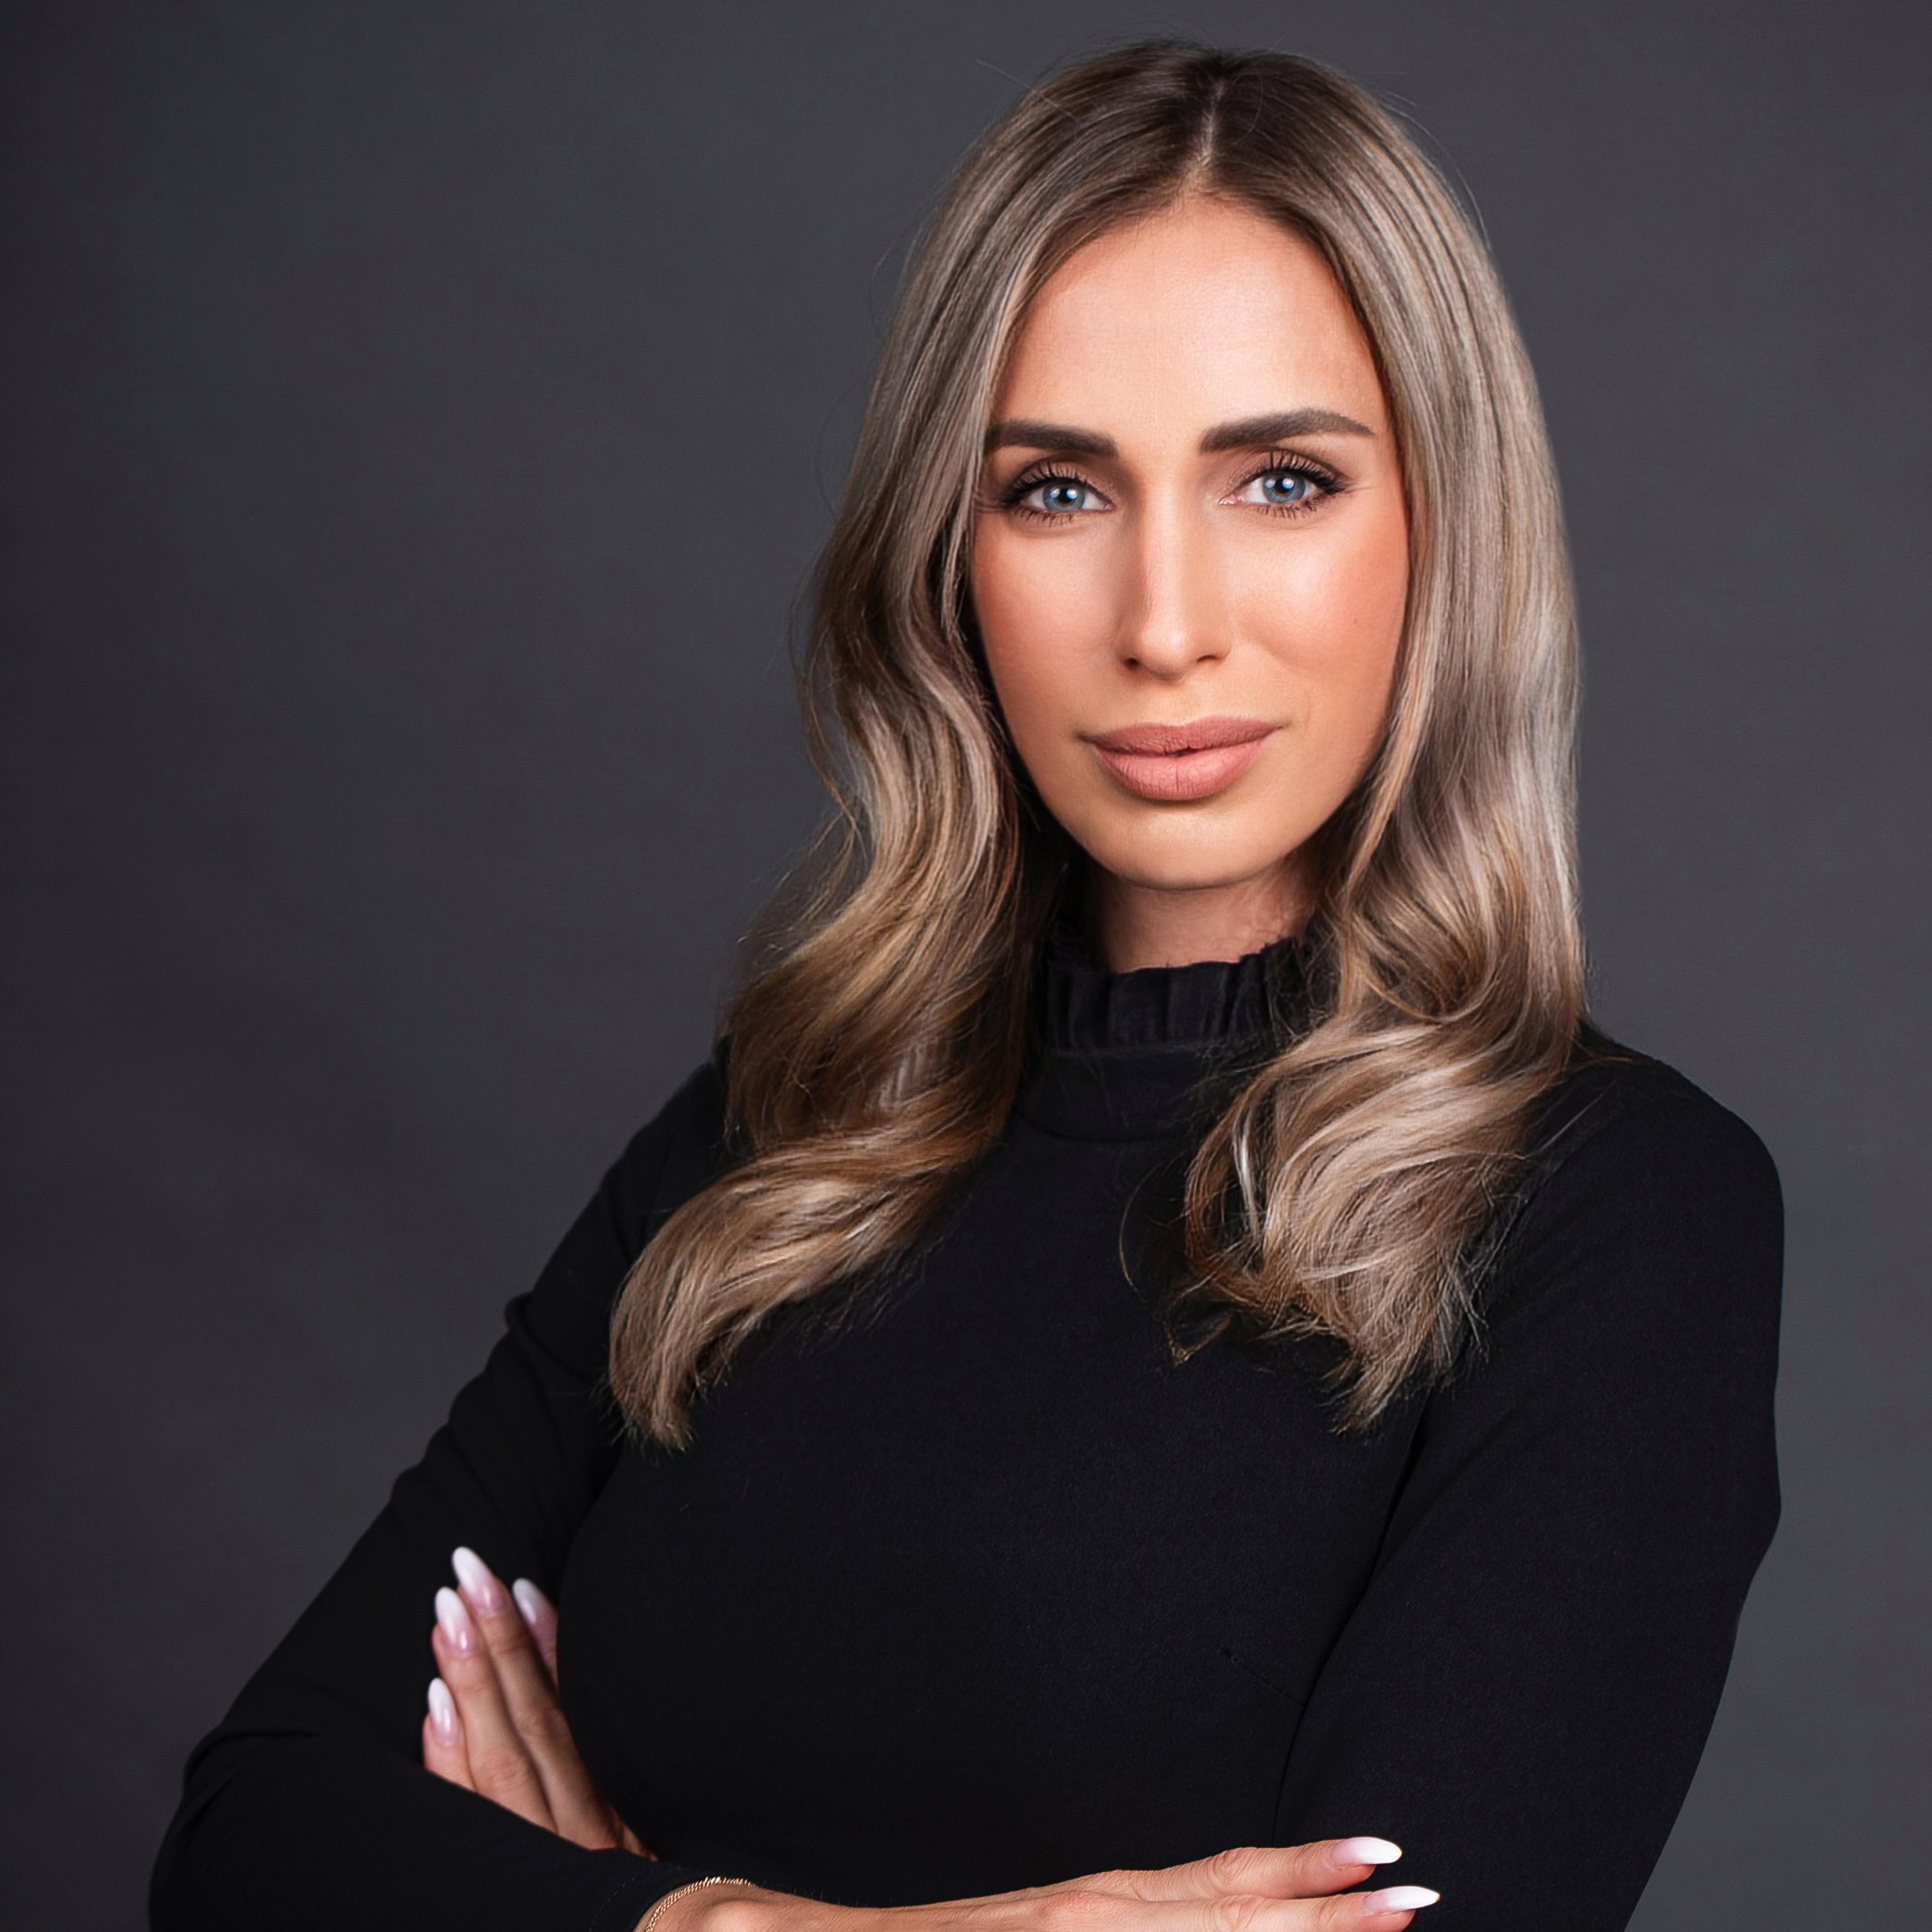 Mgr. Miriam Oravkinová - senior real estate agent